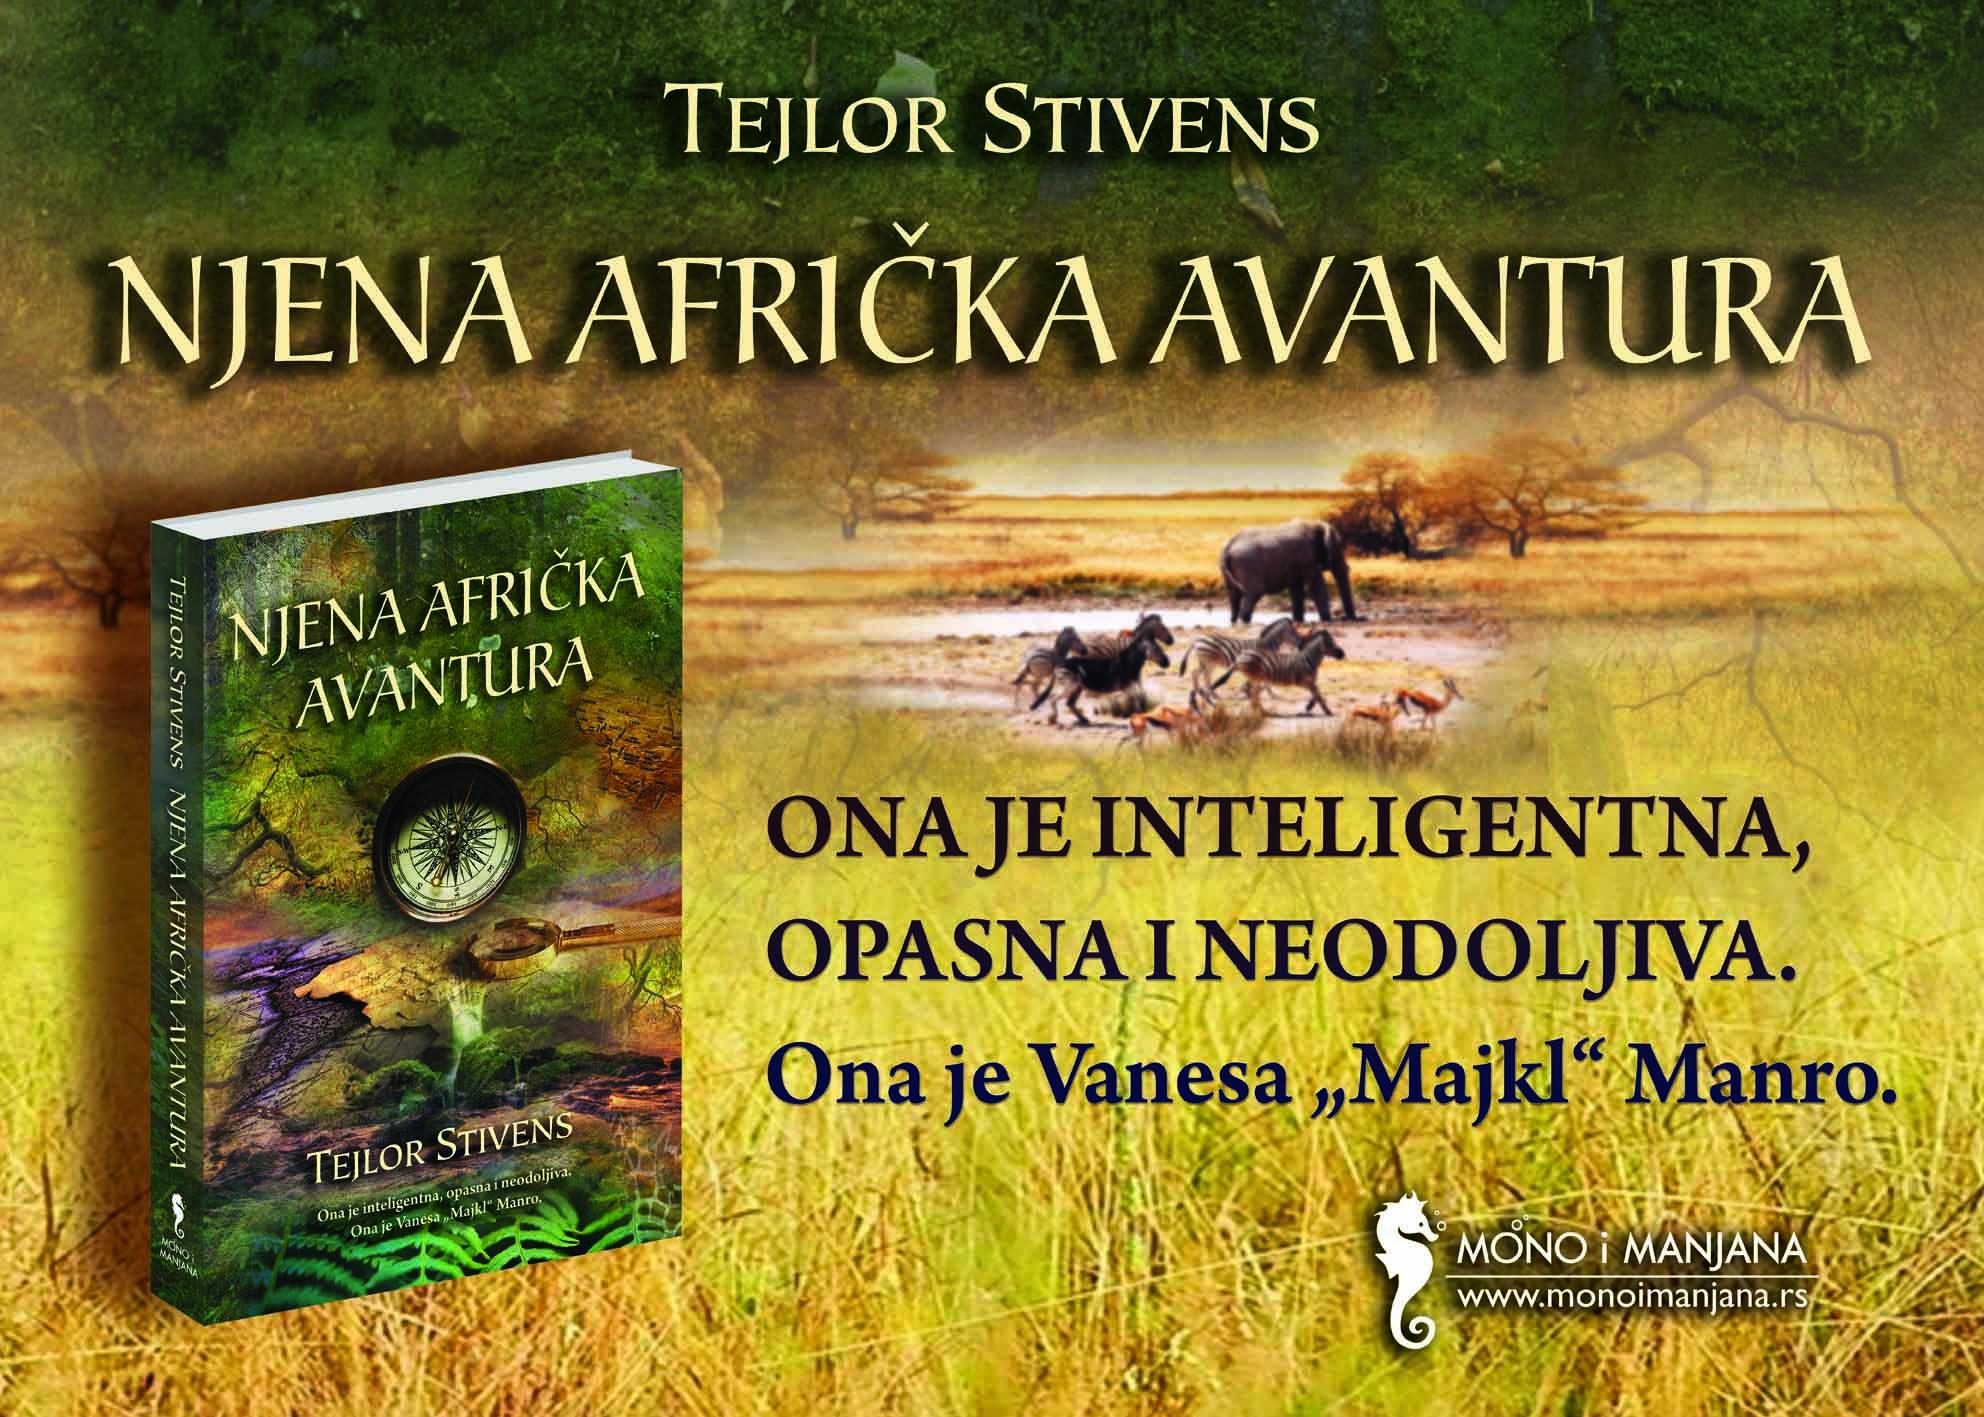 Njena Africka Avantura poster